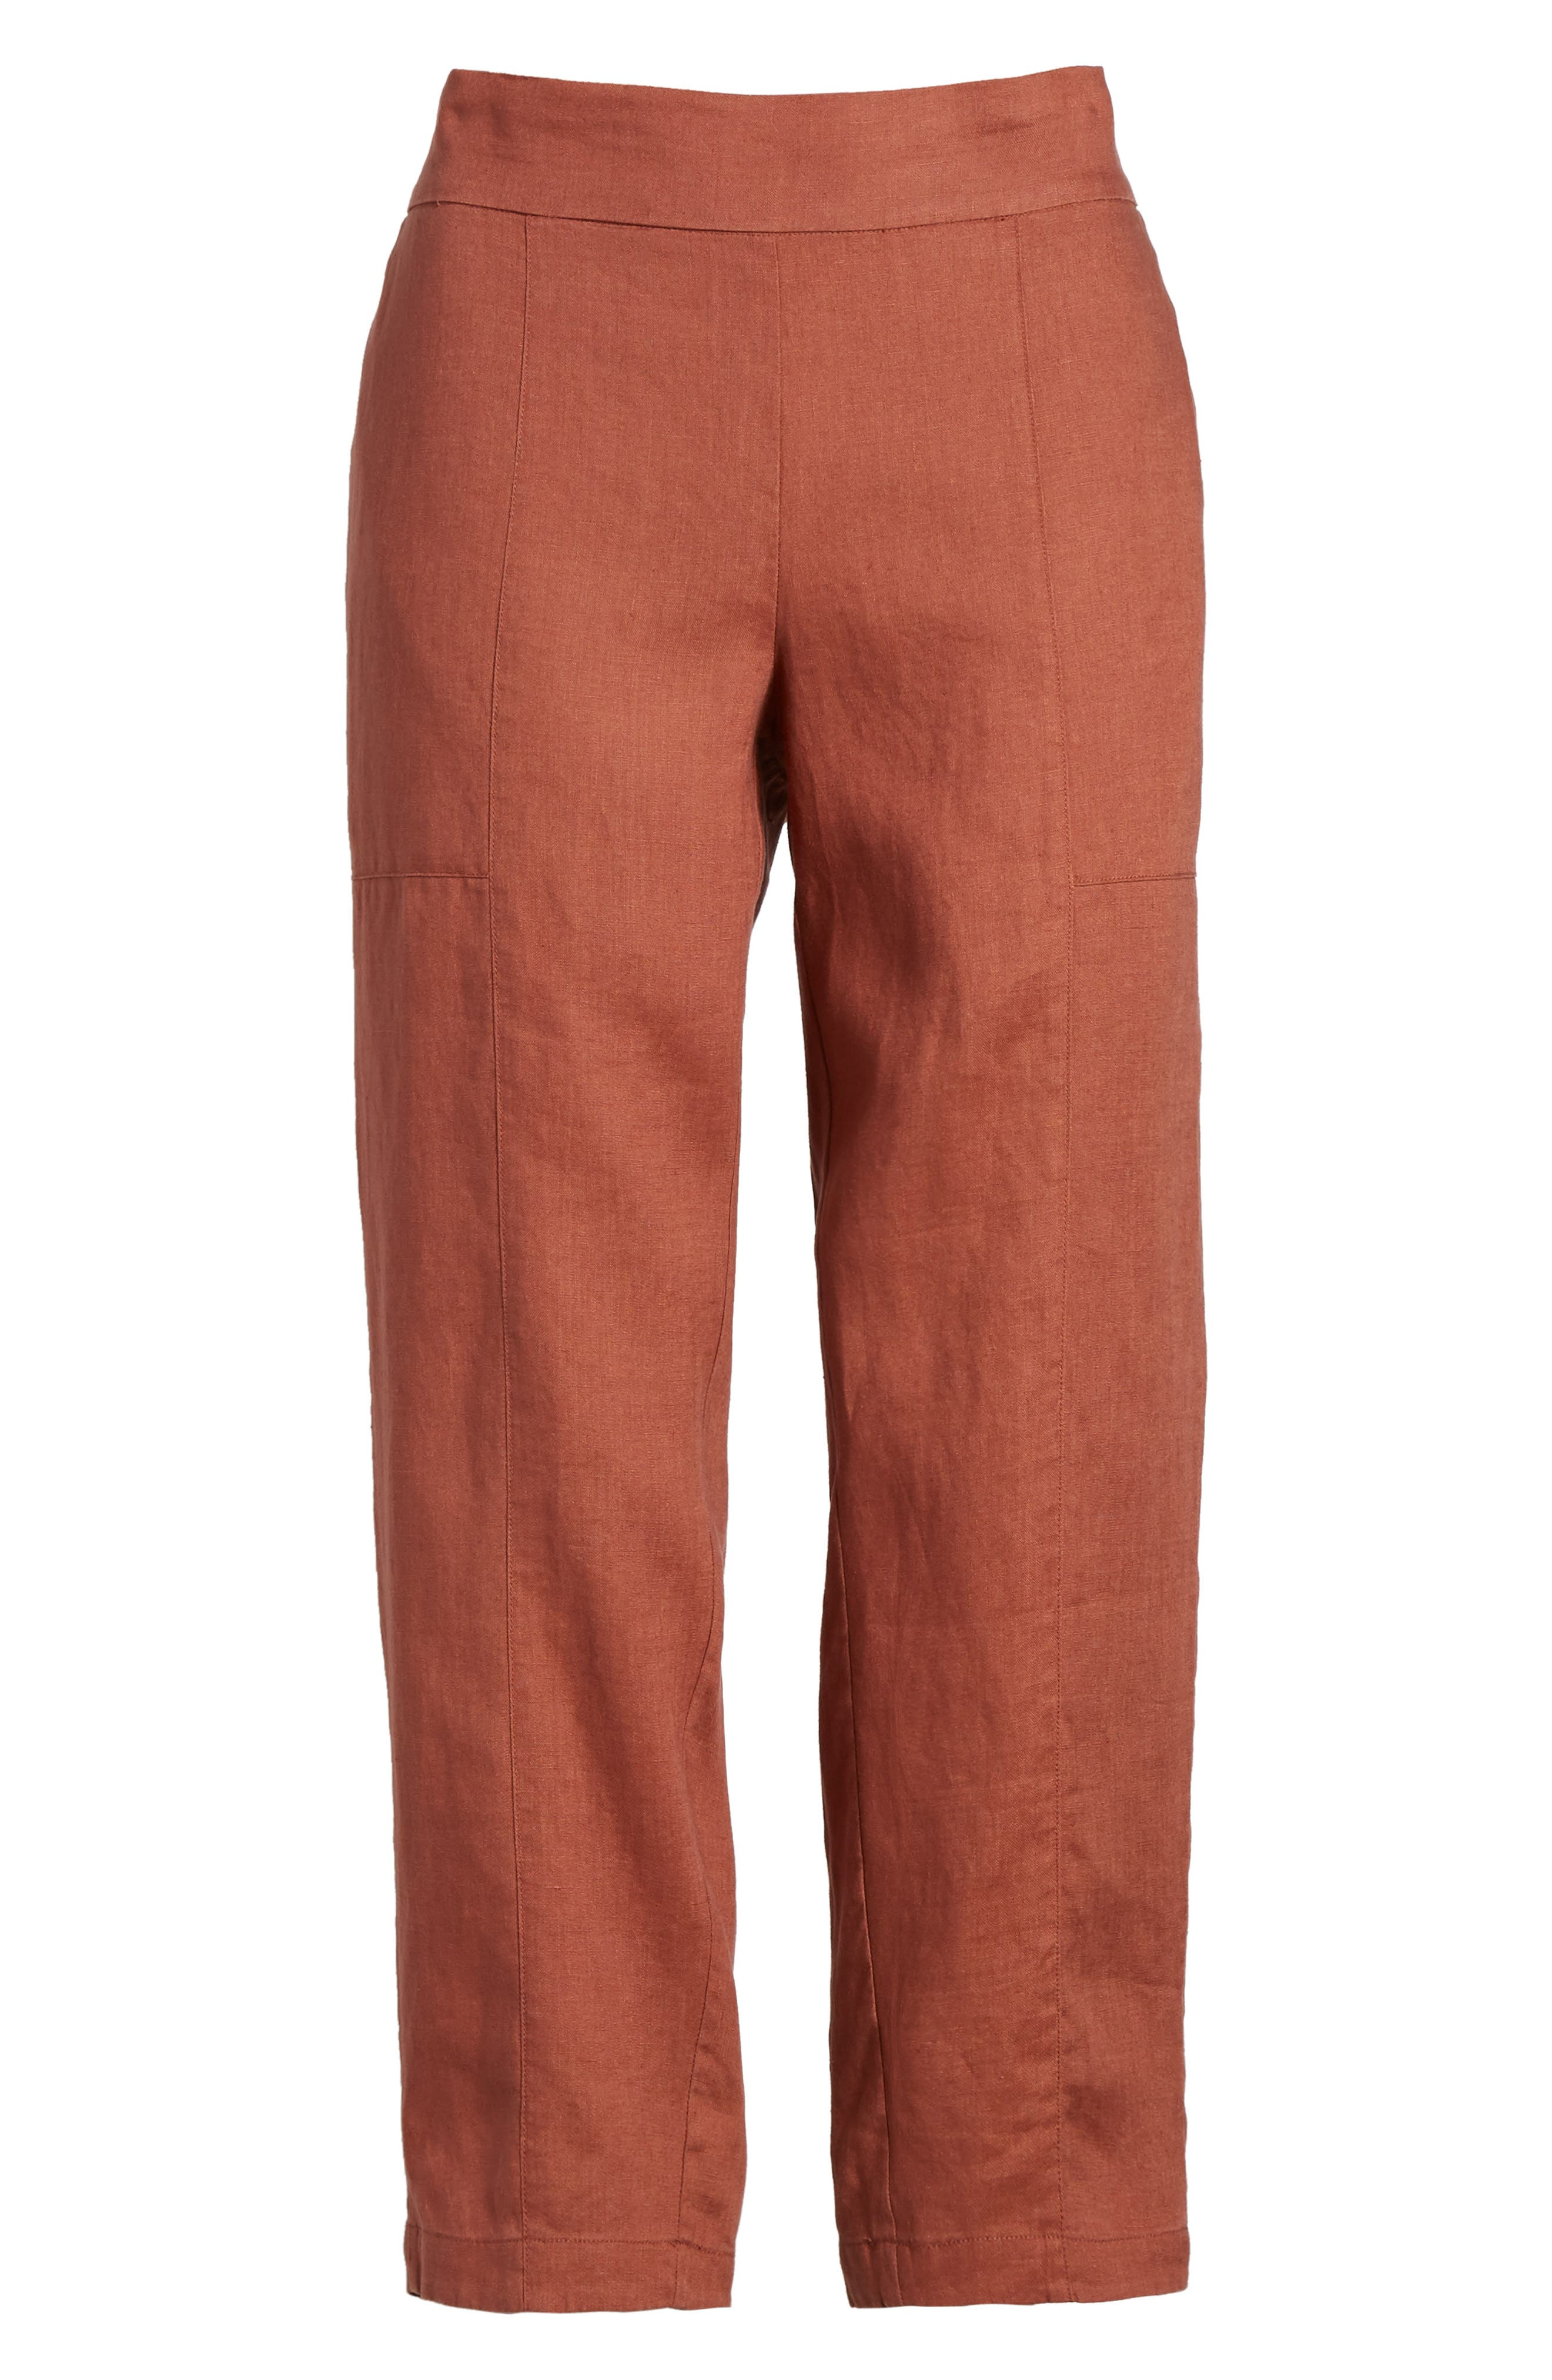 Organic Linen Crop Pants,                             Alternate thumbnail 24, color,